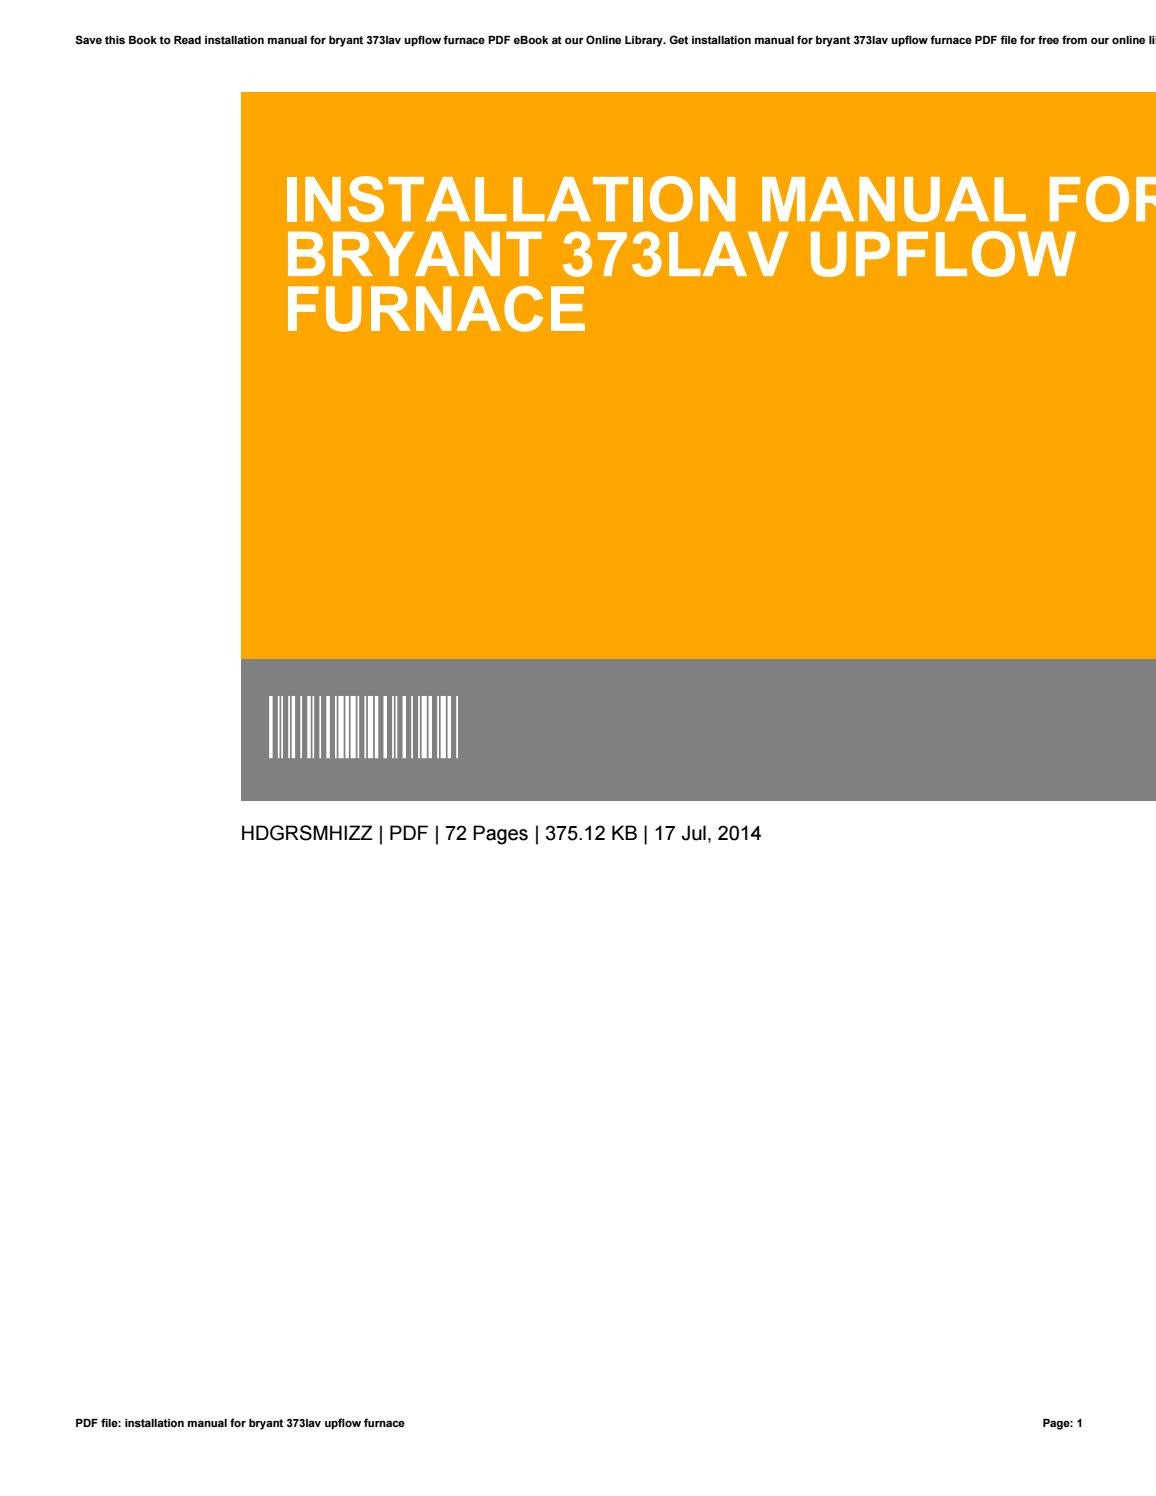 Installation manual for bryant 373lav upflow furnace by  MargueriteHirsch4701 - issuu